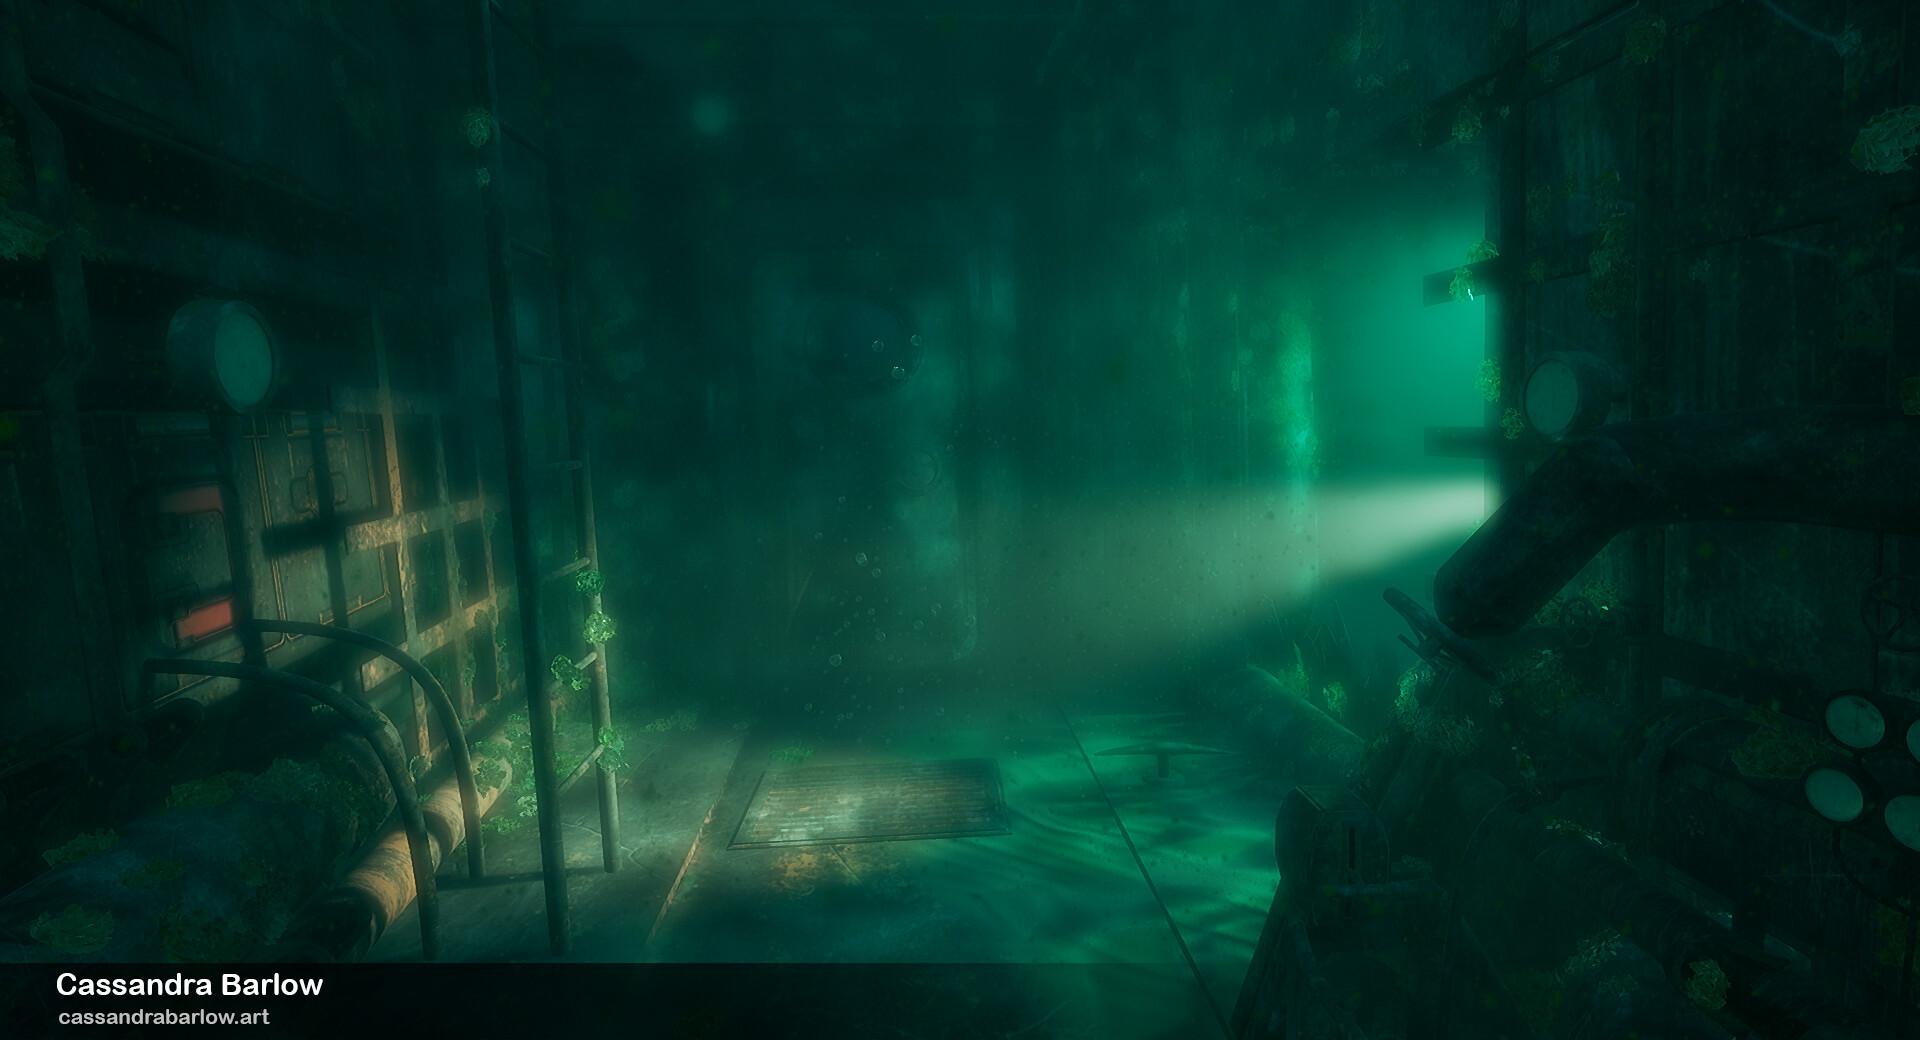 Cassandra barlow cassandrabarlow submarinewreck 4